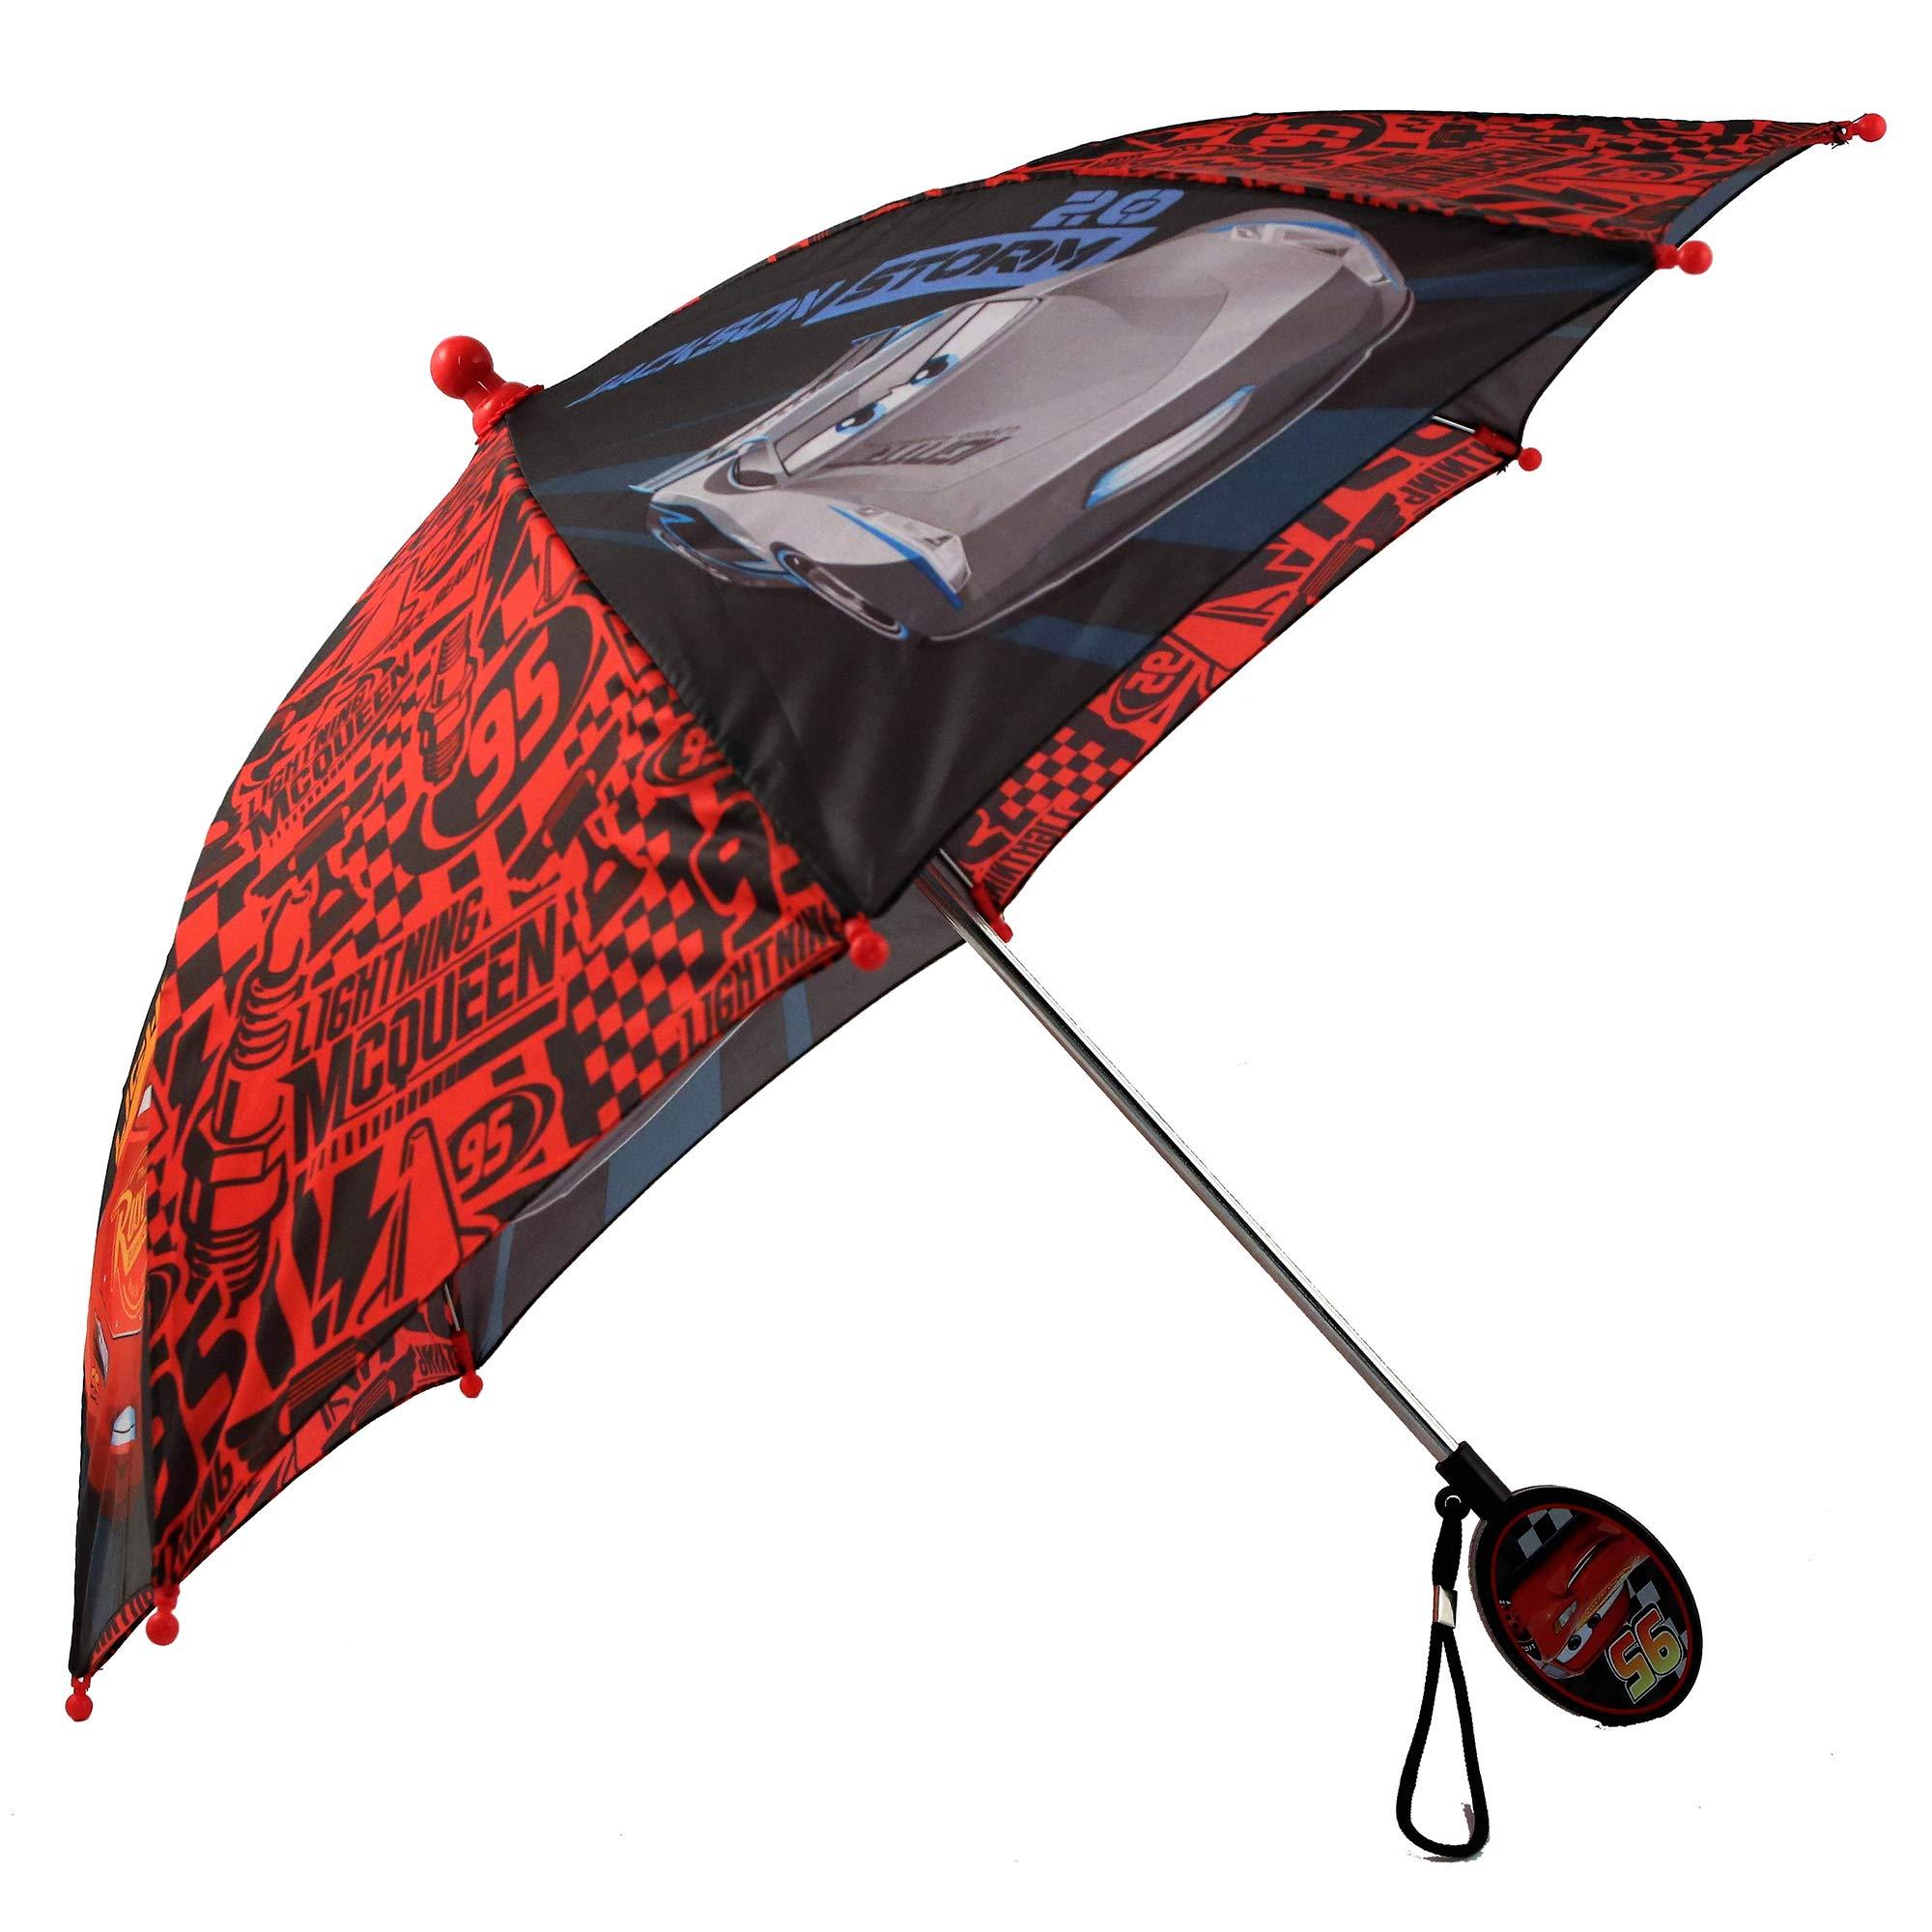 Disney Lightning Rainwear Character Umbrella